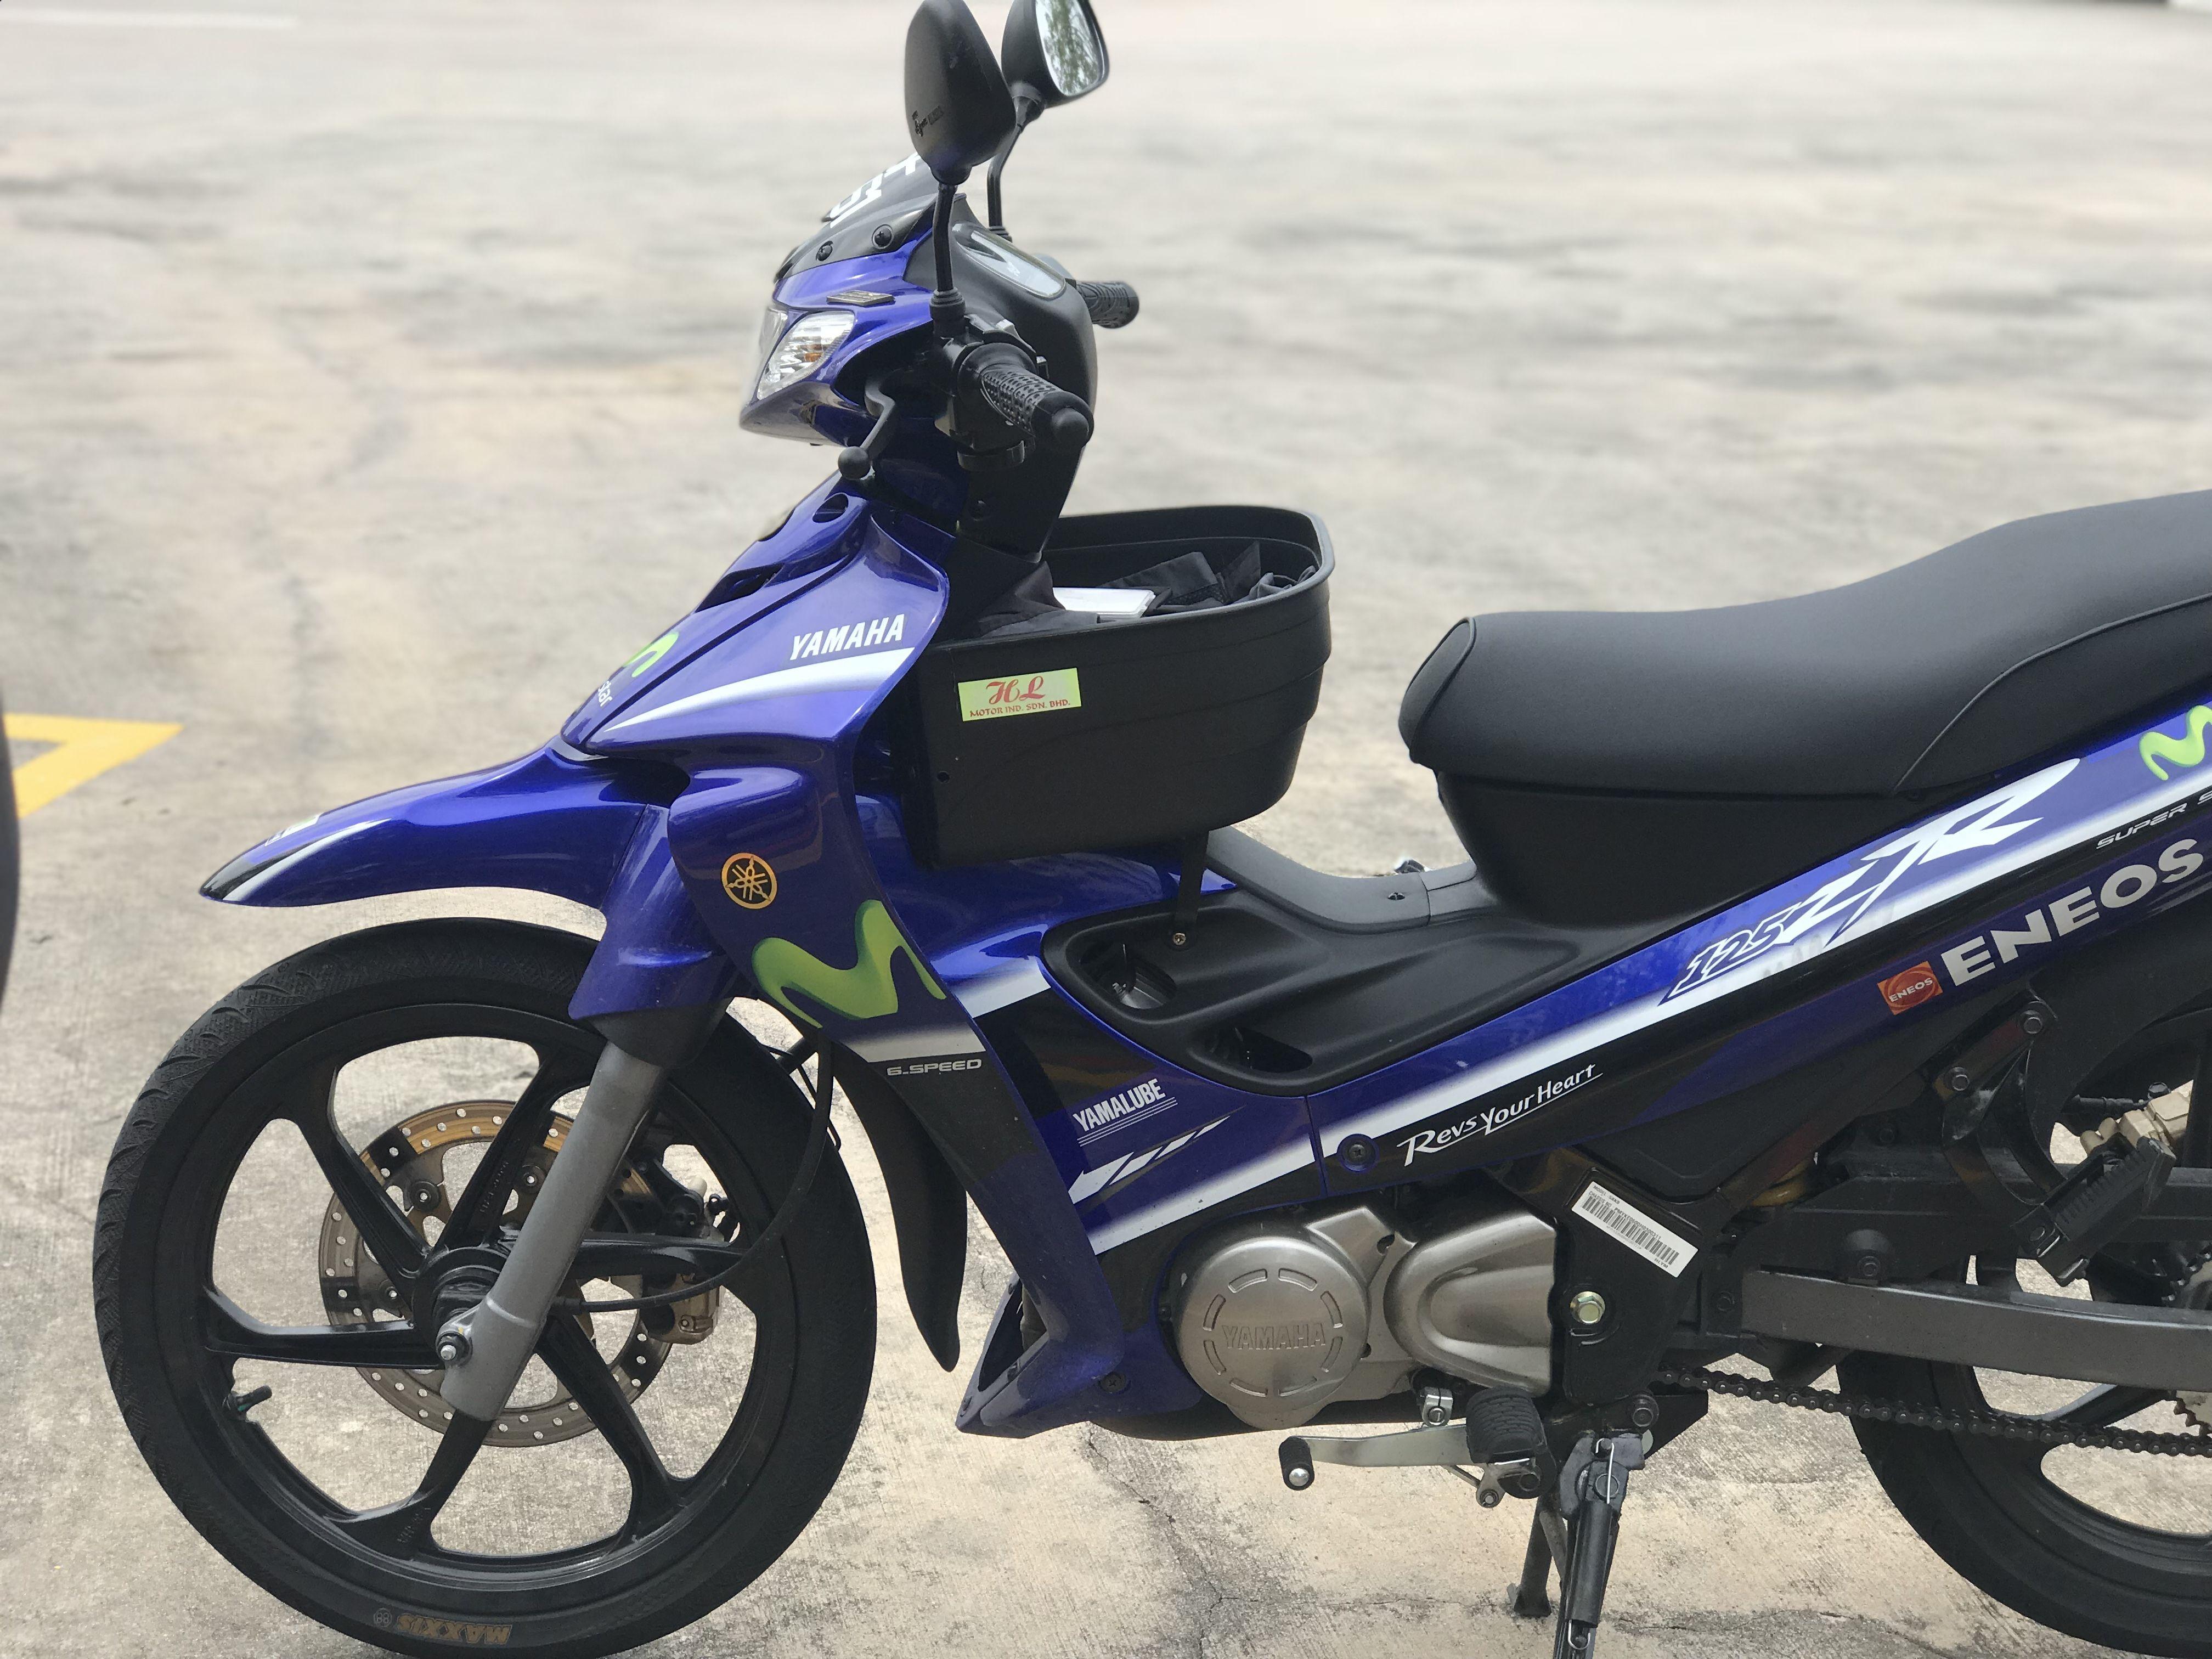 Yamaha 125zr Movistar Yamaha 125zr Movistar Yamaha Motorcycle